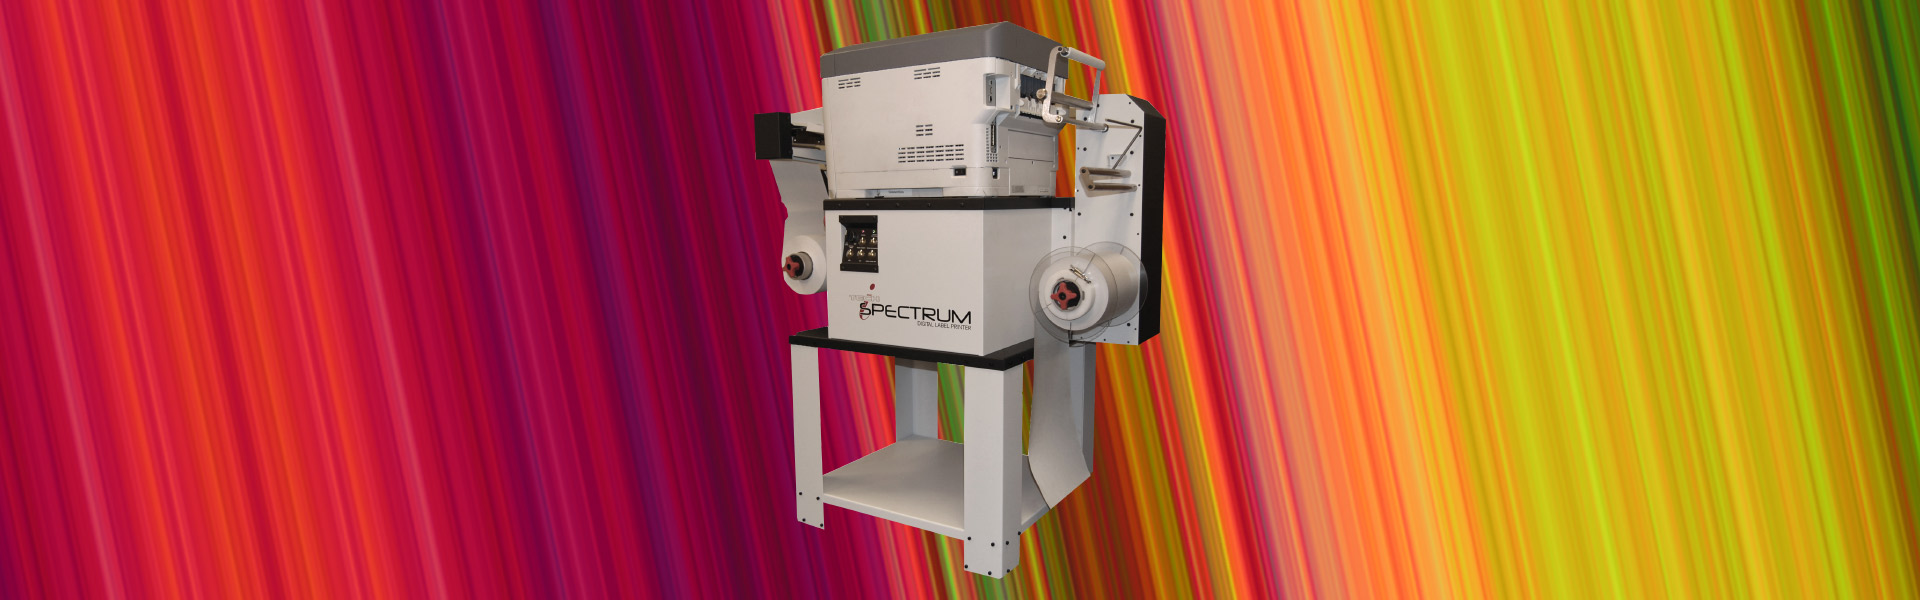 iTech SPECTRUM - Digitales Drucksystem